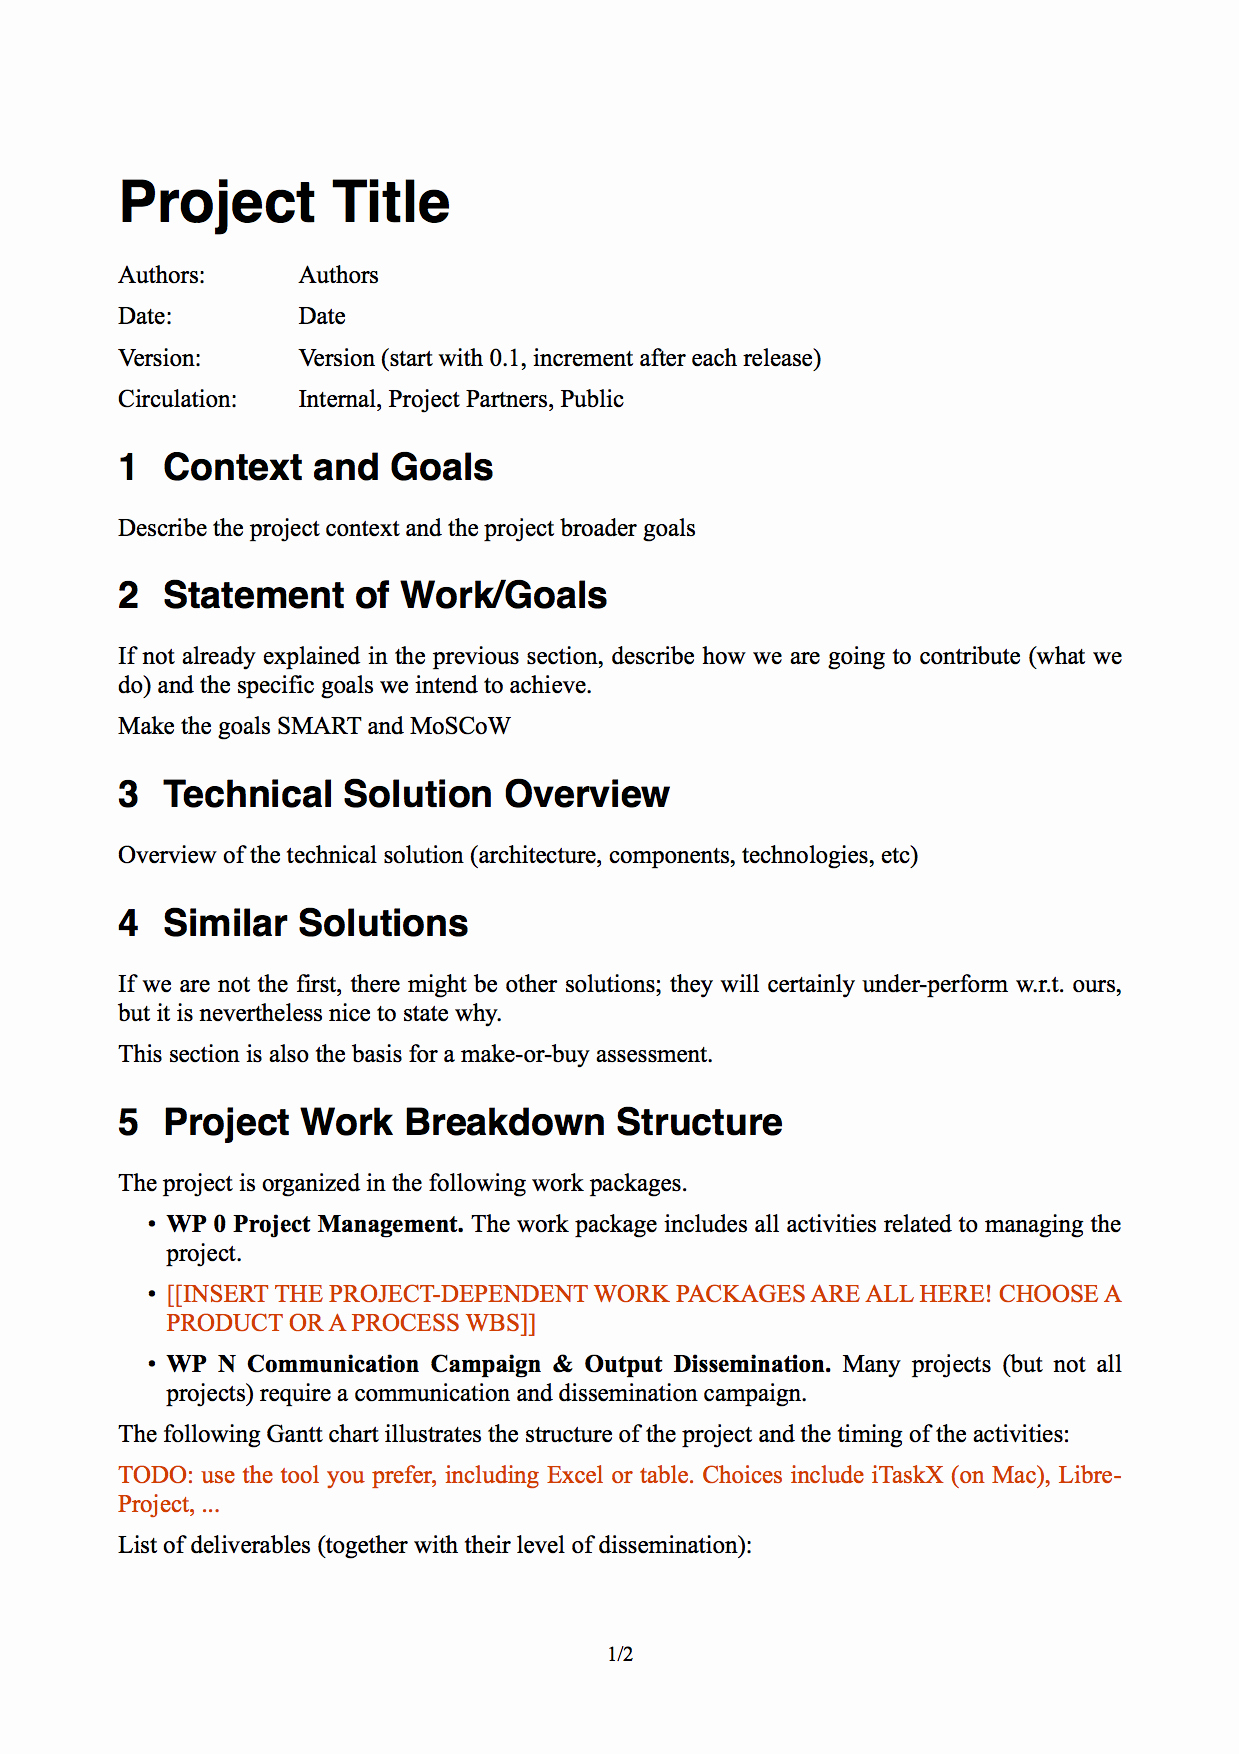 Software Development Proposal Template Luxury software Development Proposal Template Doc